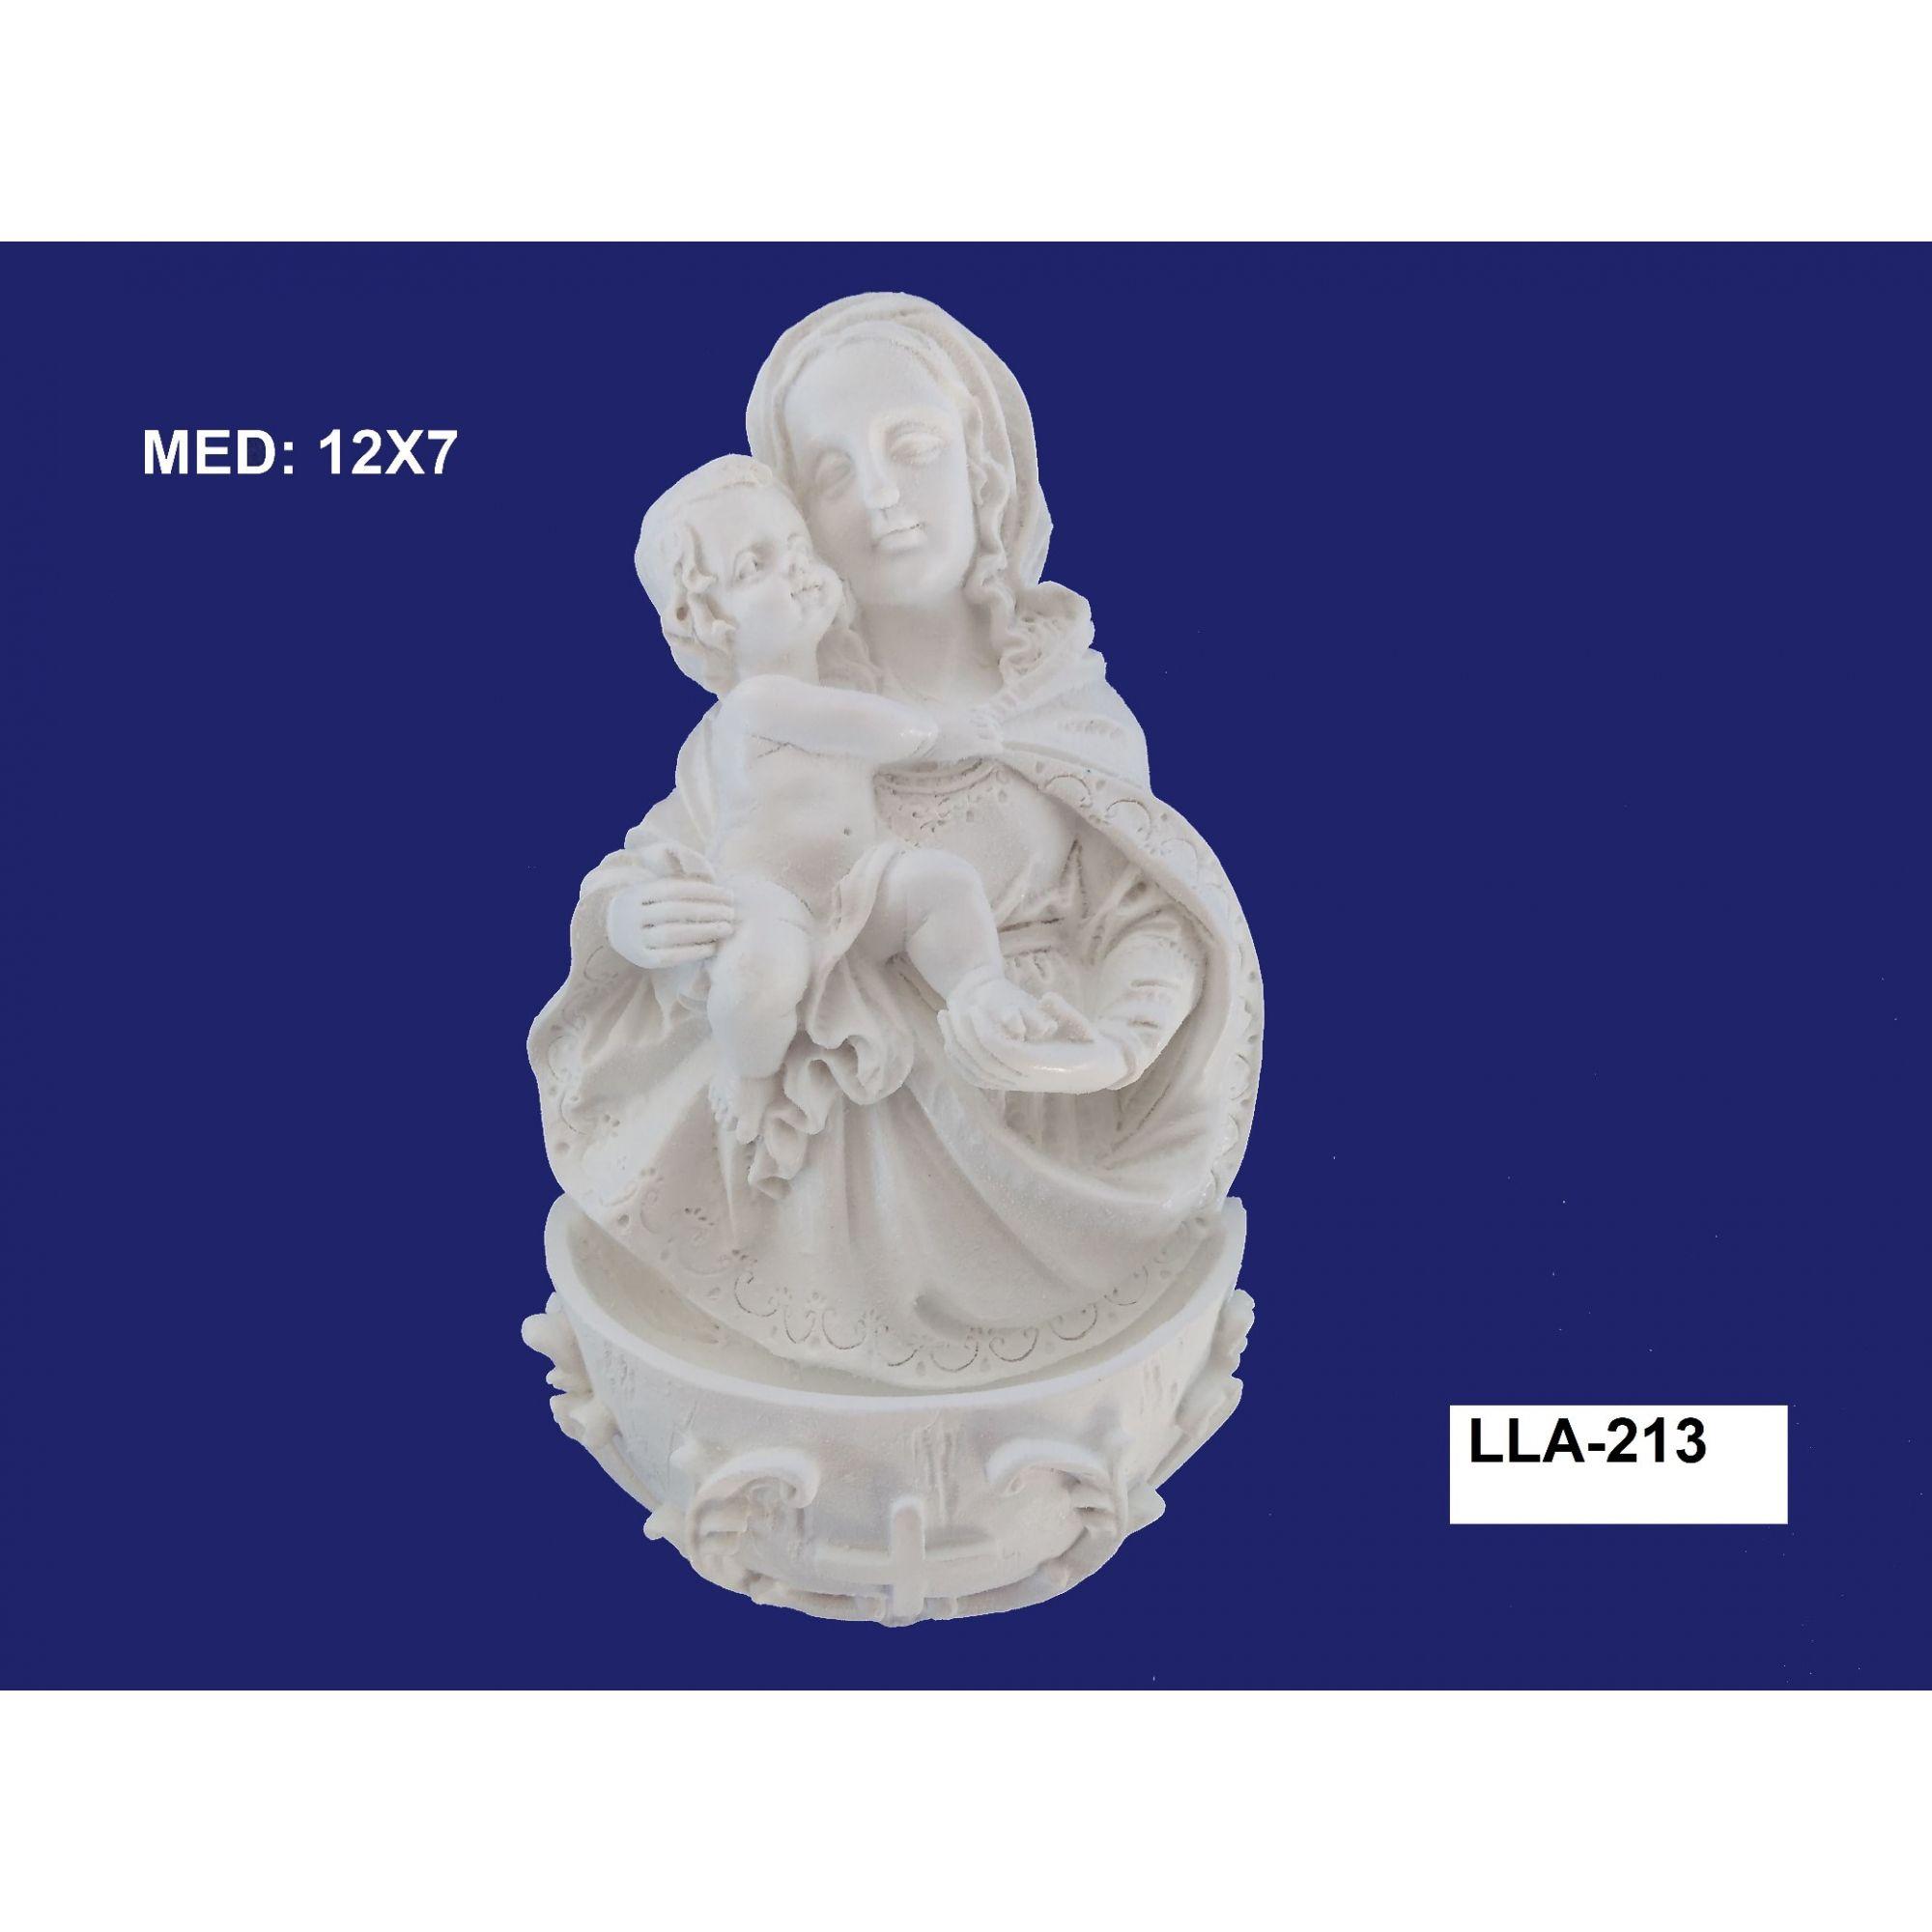 LLA-213 APLIQUE MARIA E JESUS C/ PIA 12X07CM